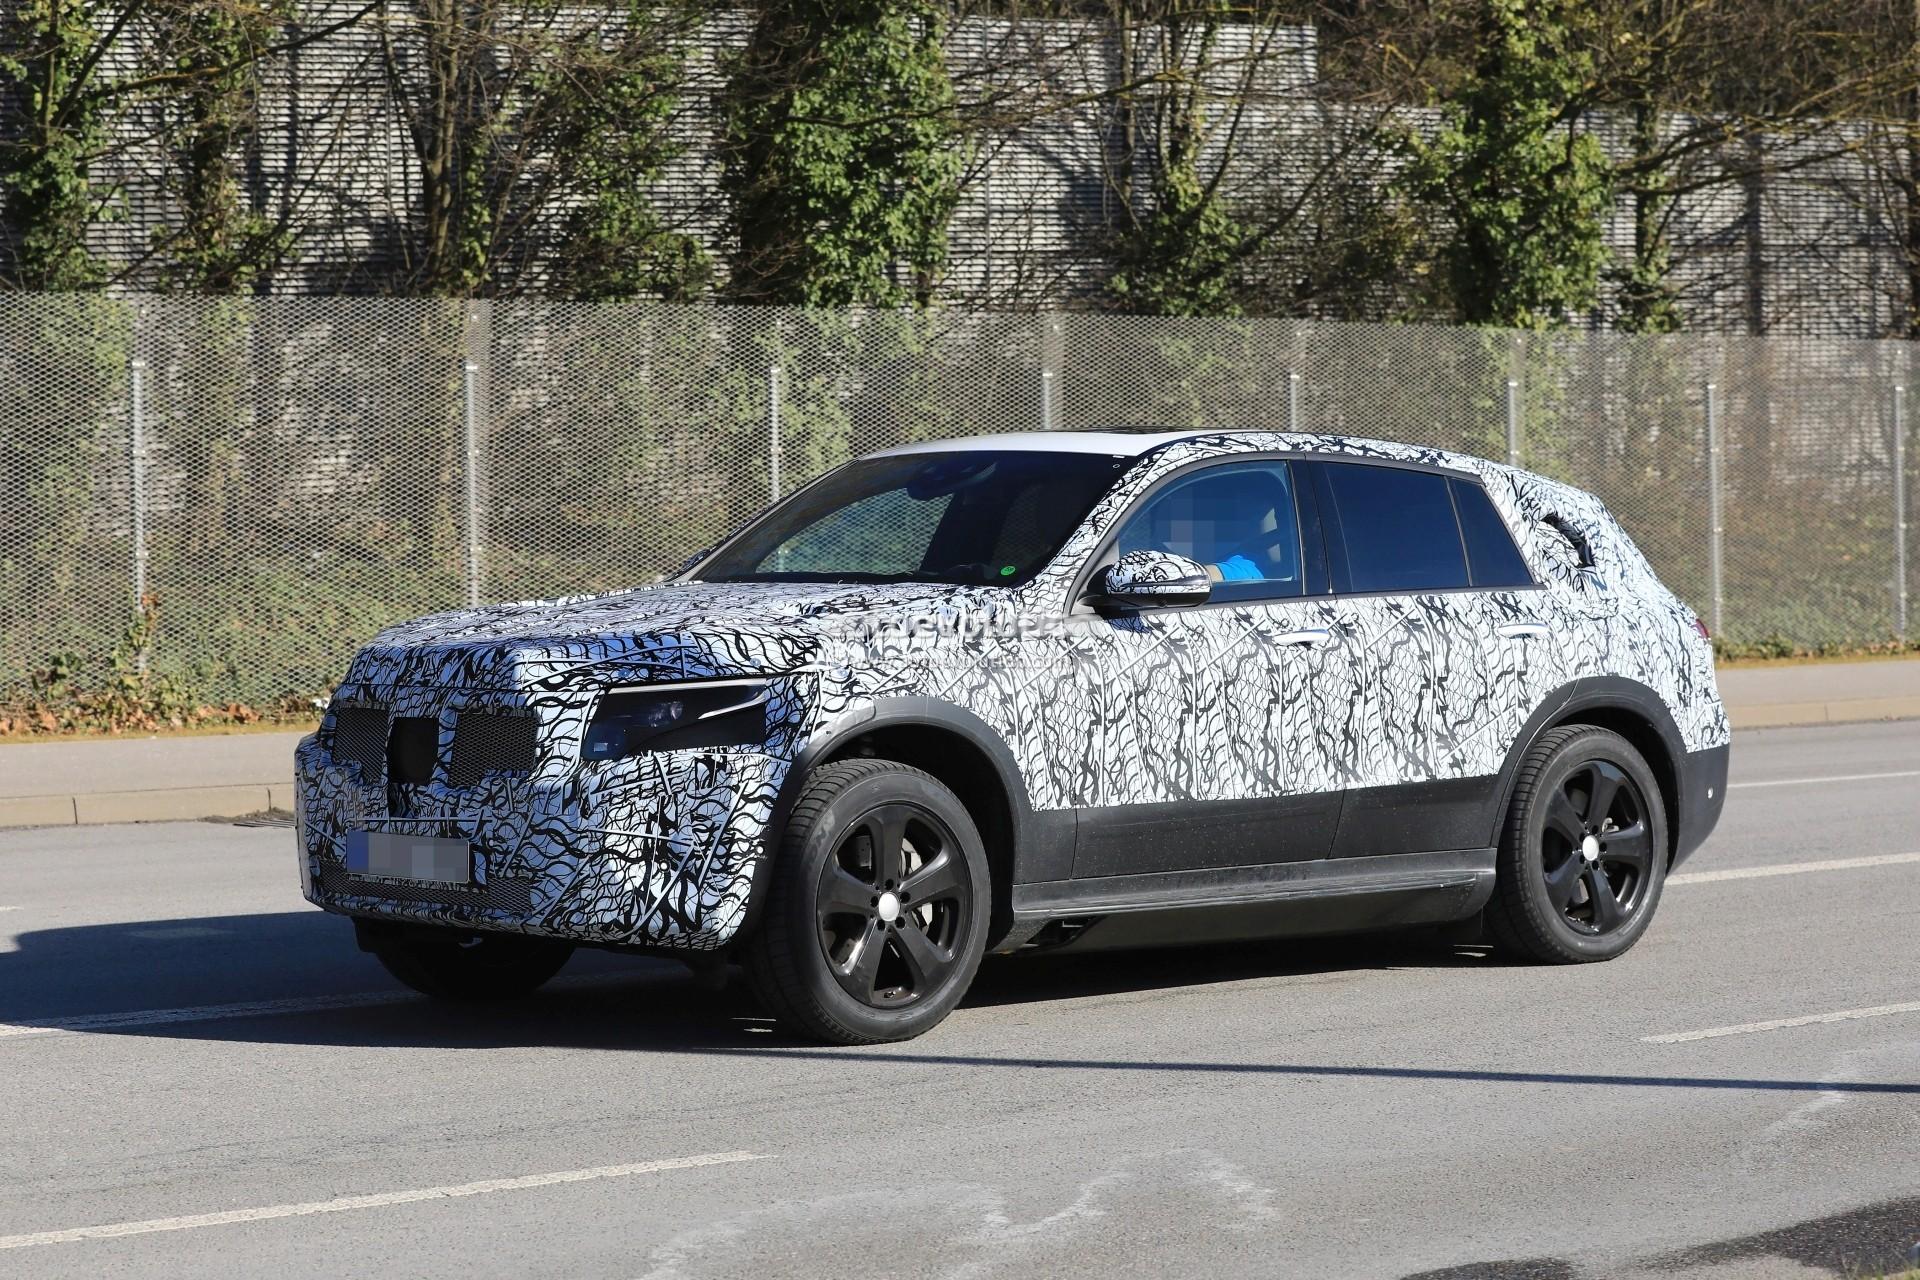 Spyshots 2020 Mercedes Benz Eqc Gets Closer To Production